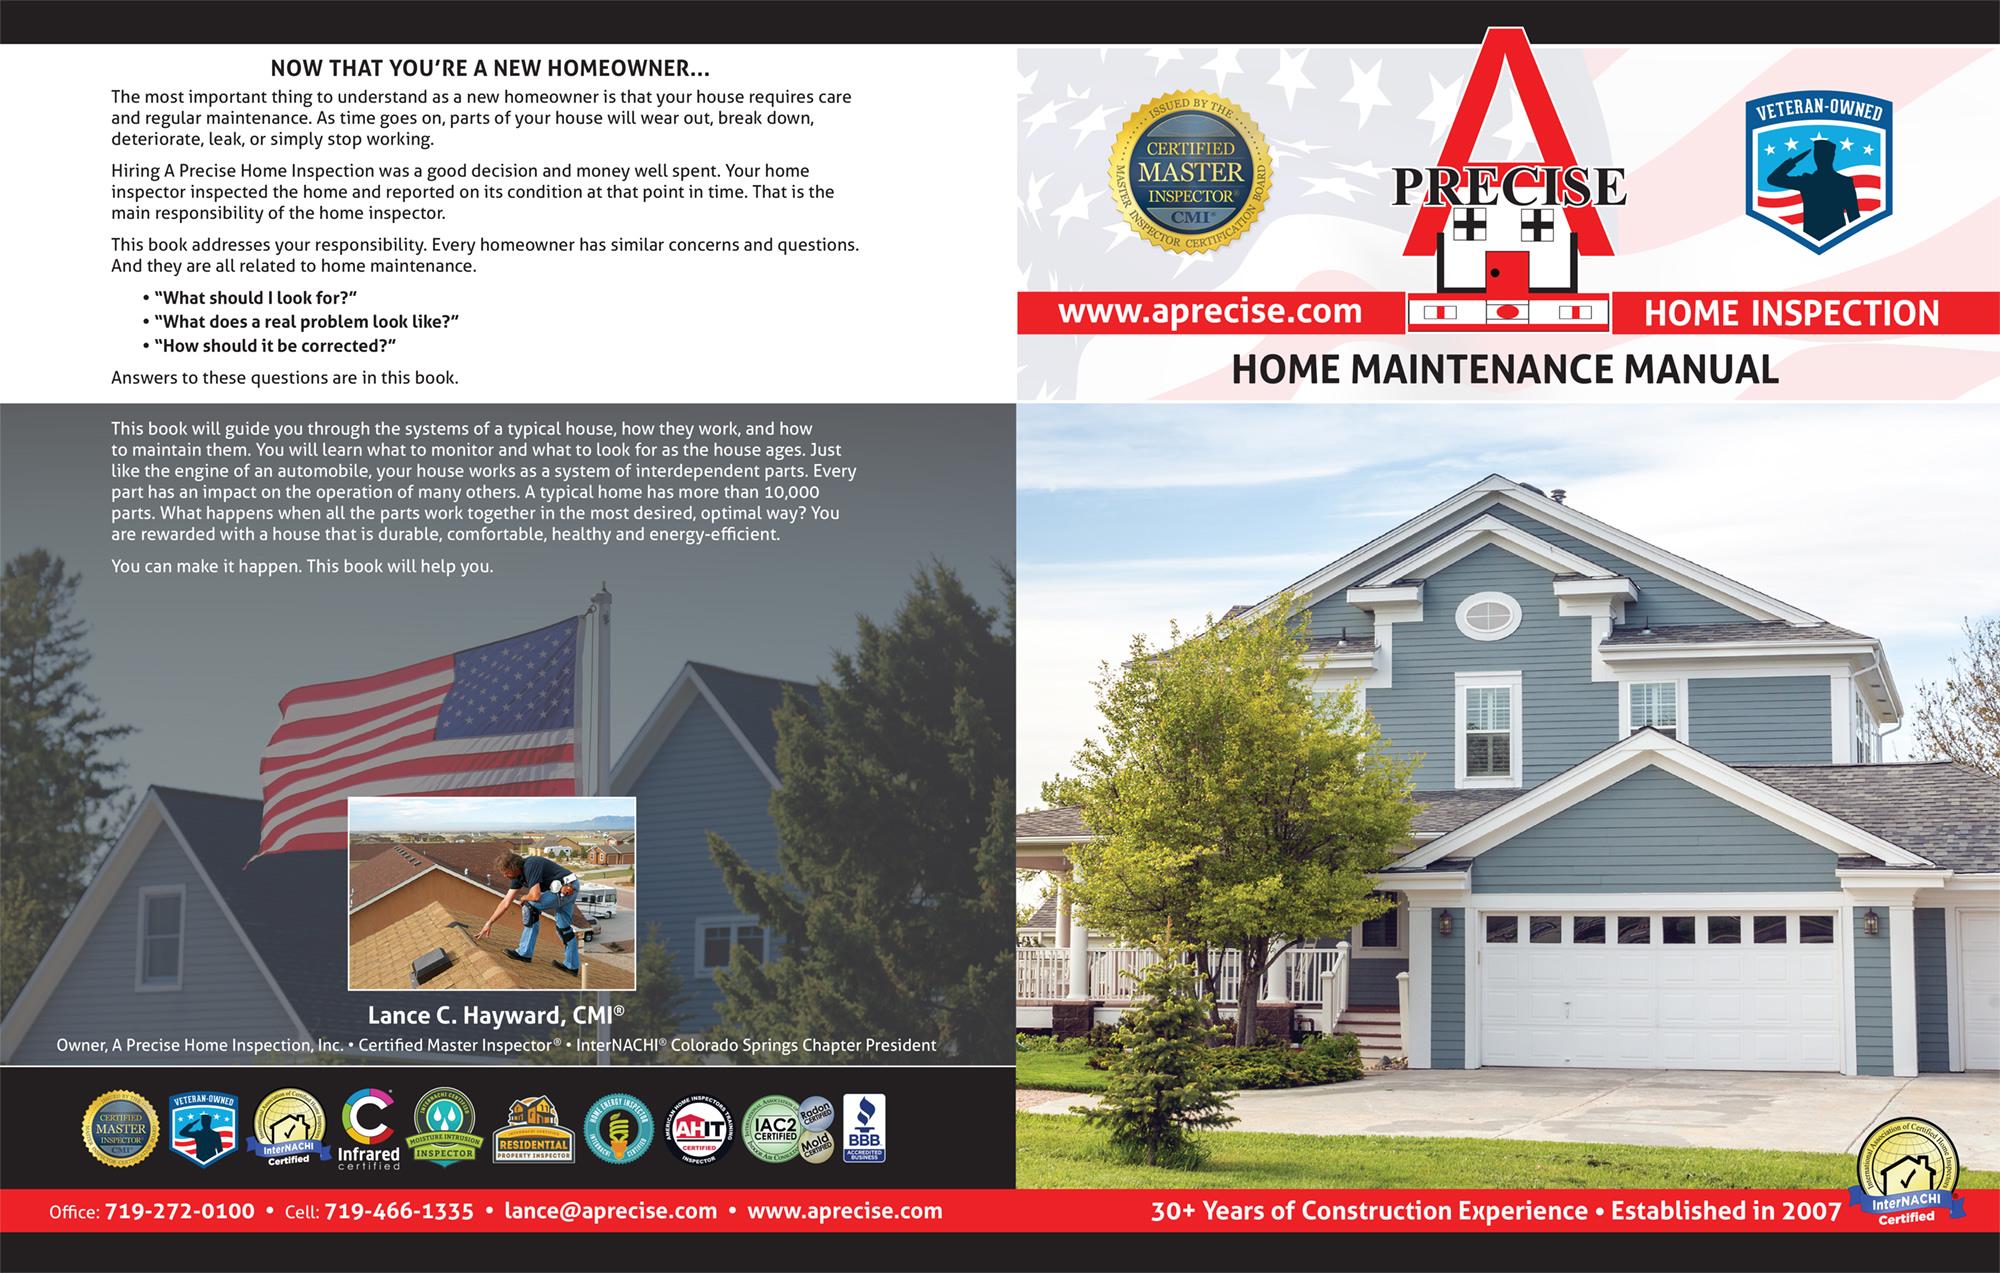 Custom Home Maintenance Books A Precise Home Inspection-Certified Master Inspector